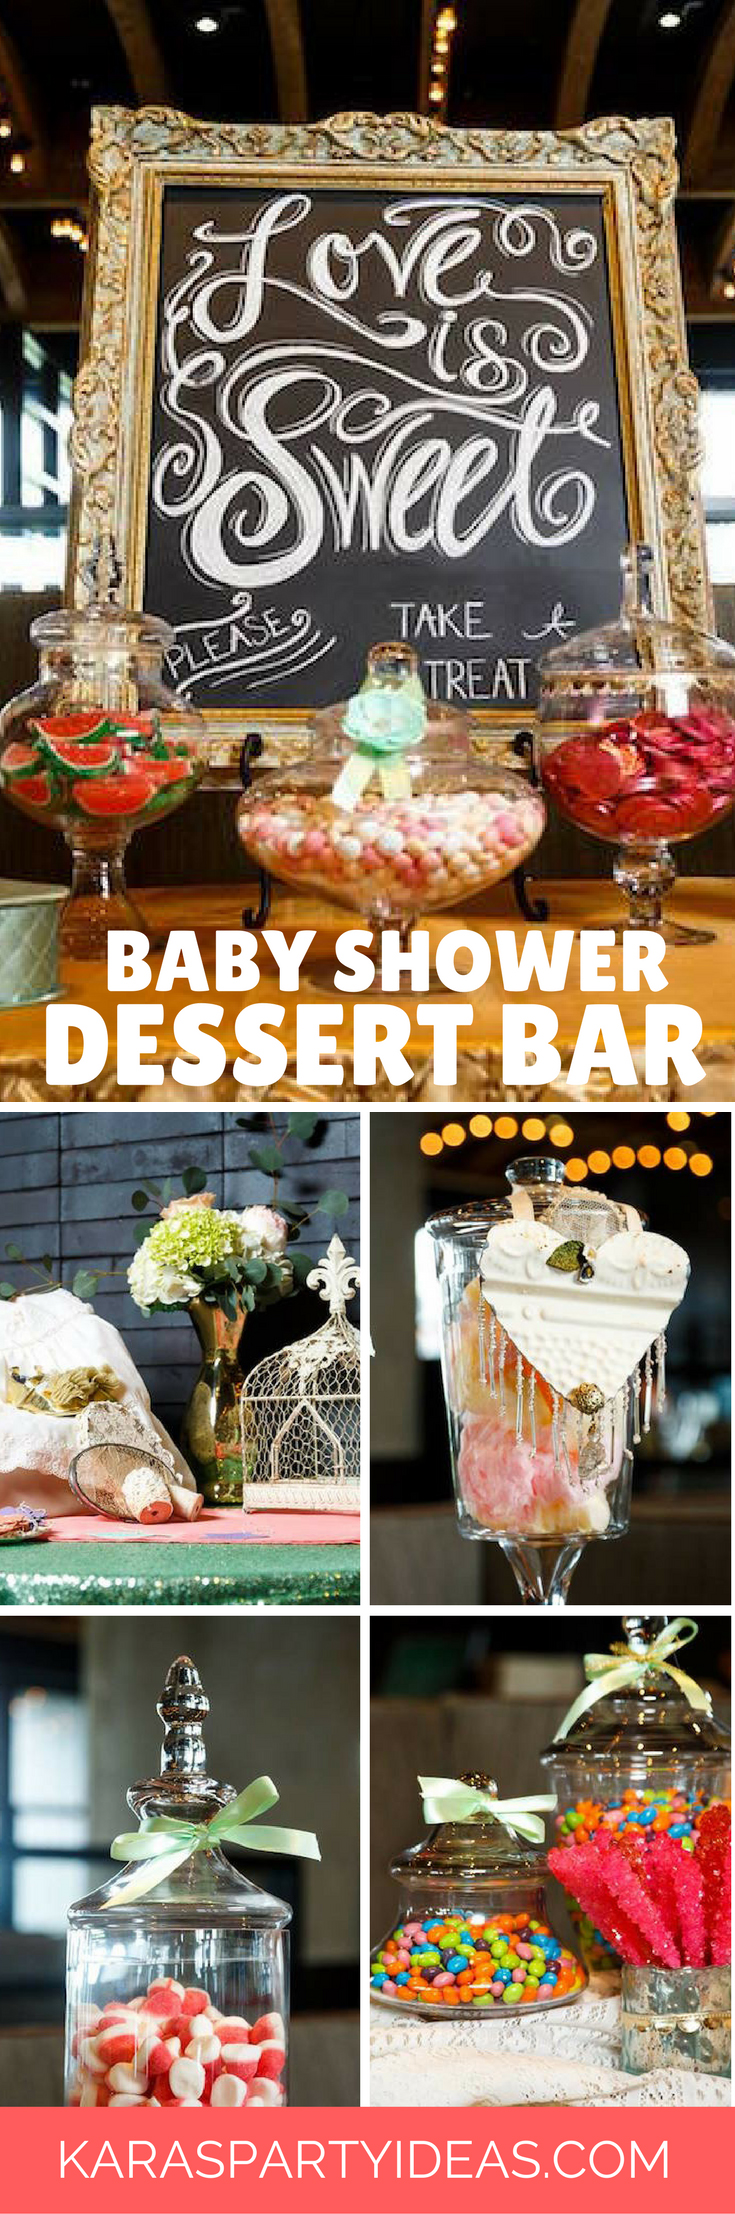 Love is Sweet Baby Shower Dessert Bar via Kara's Party Ideas - KarasPartyIdeas.com